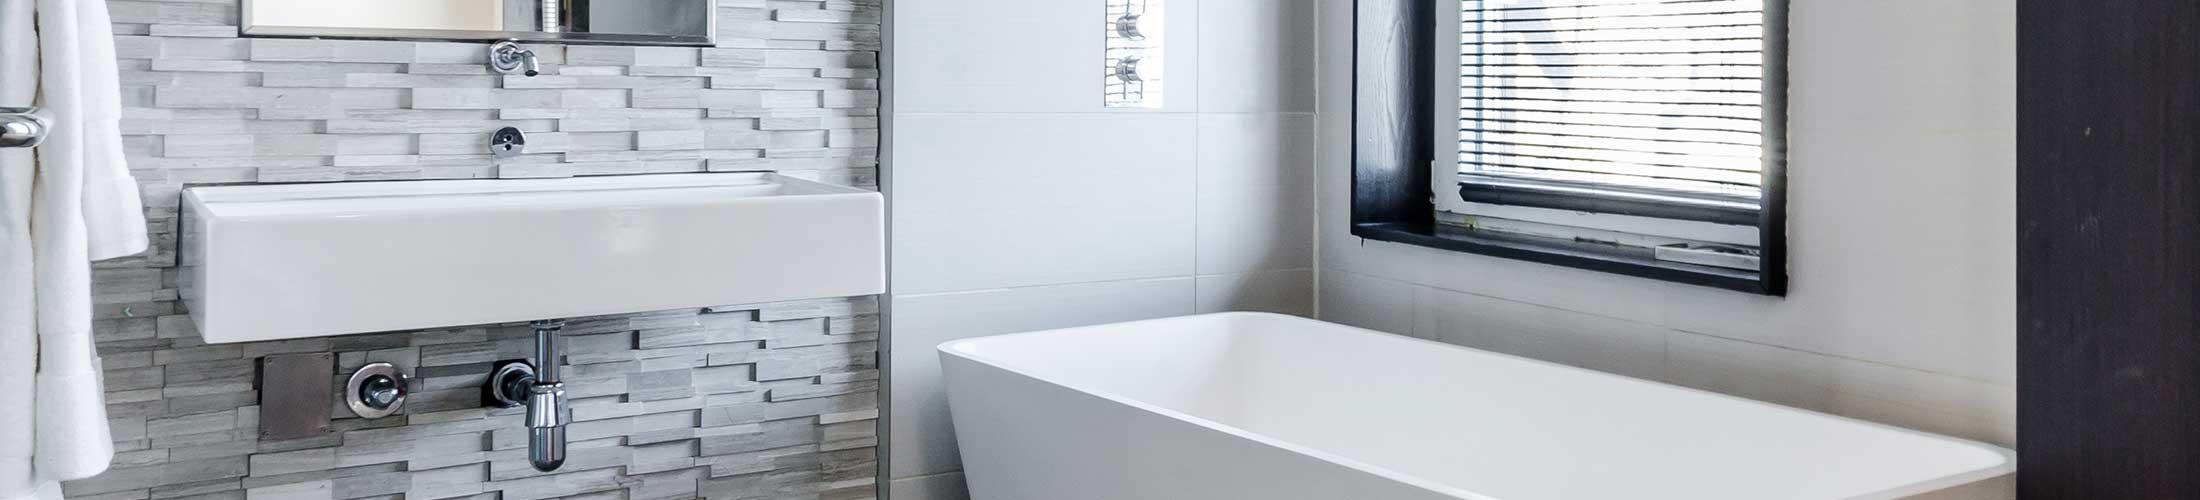 Badezimmer Armaturen